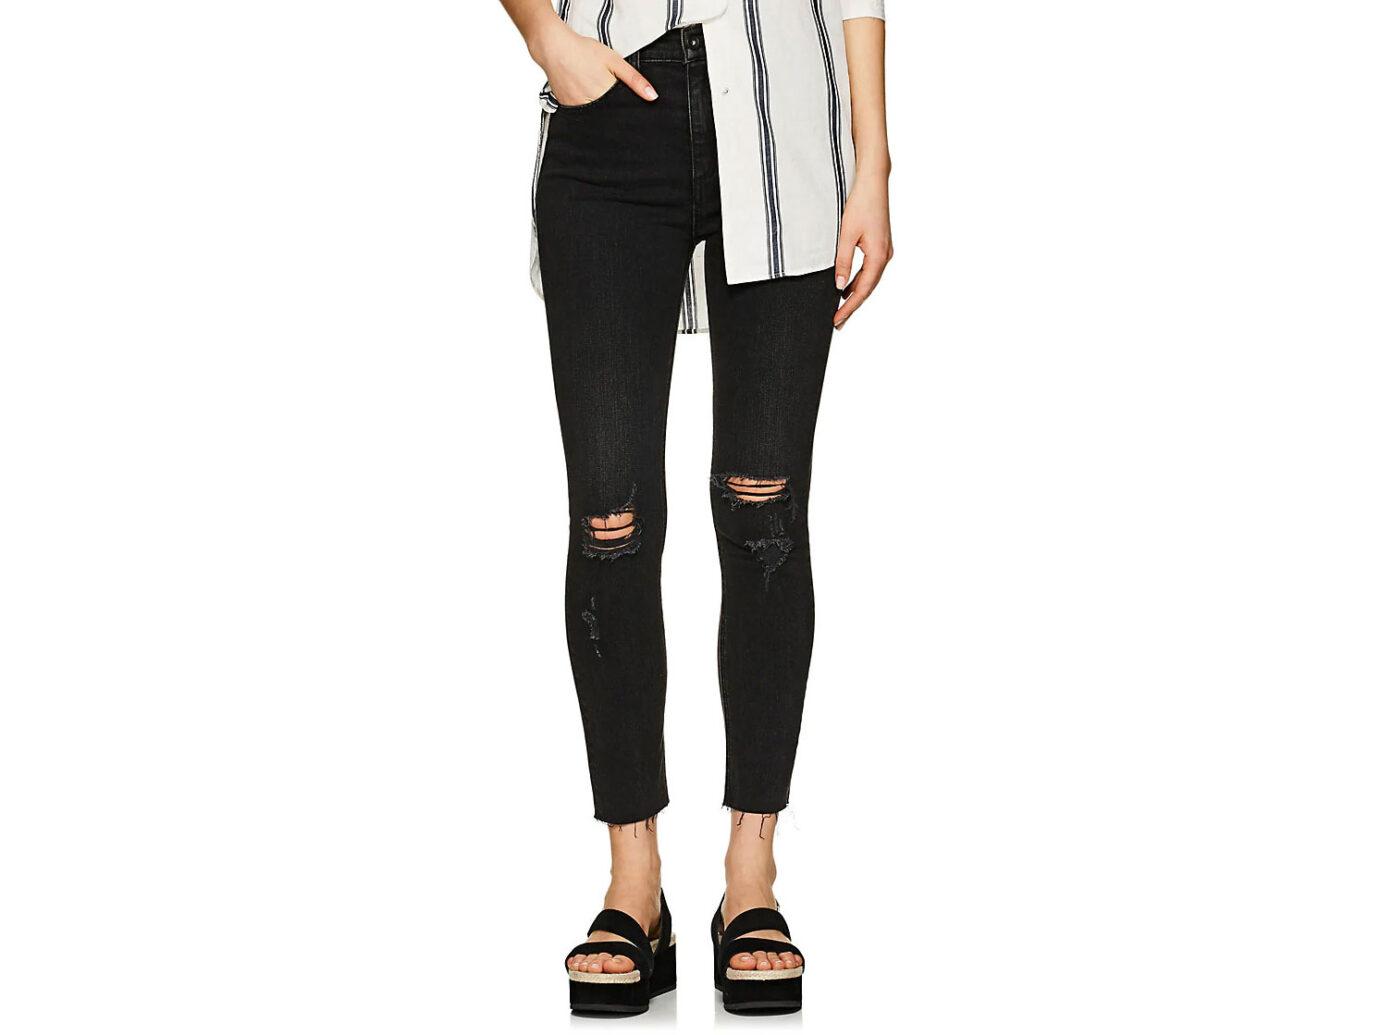 RAG & BONE High Rise Ankle Skinny Distressed Jeans